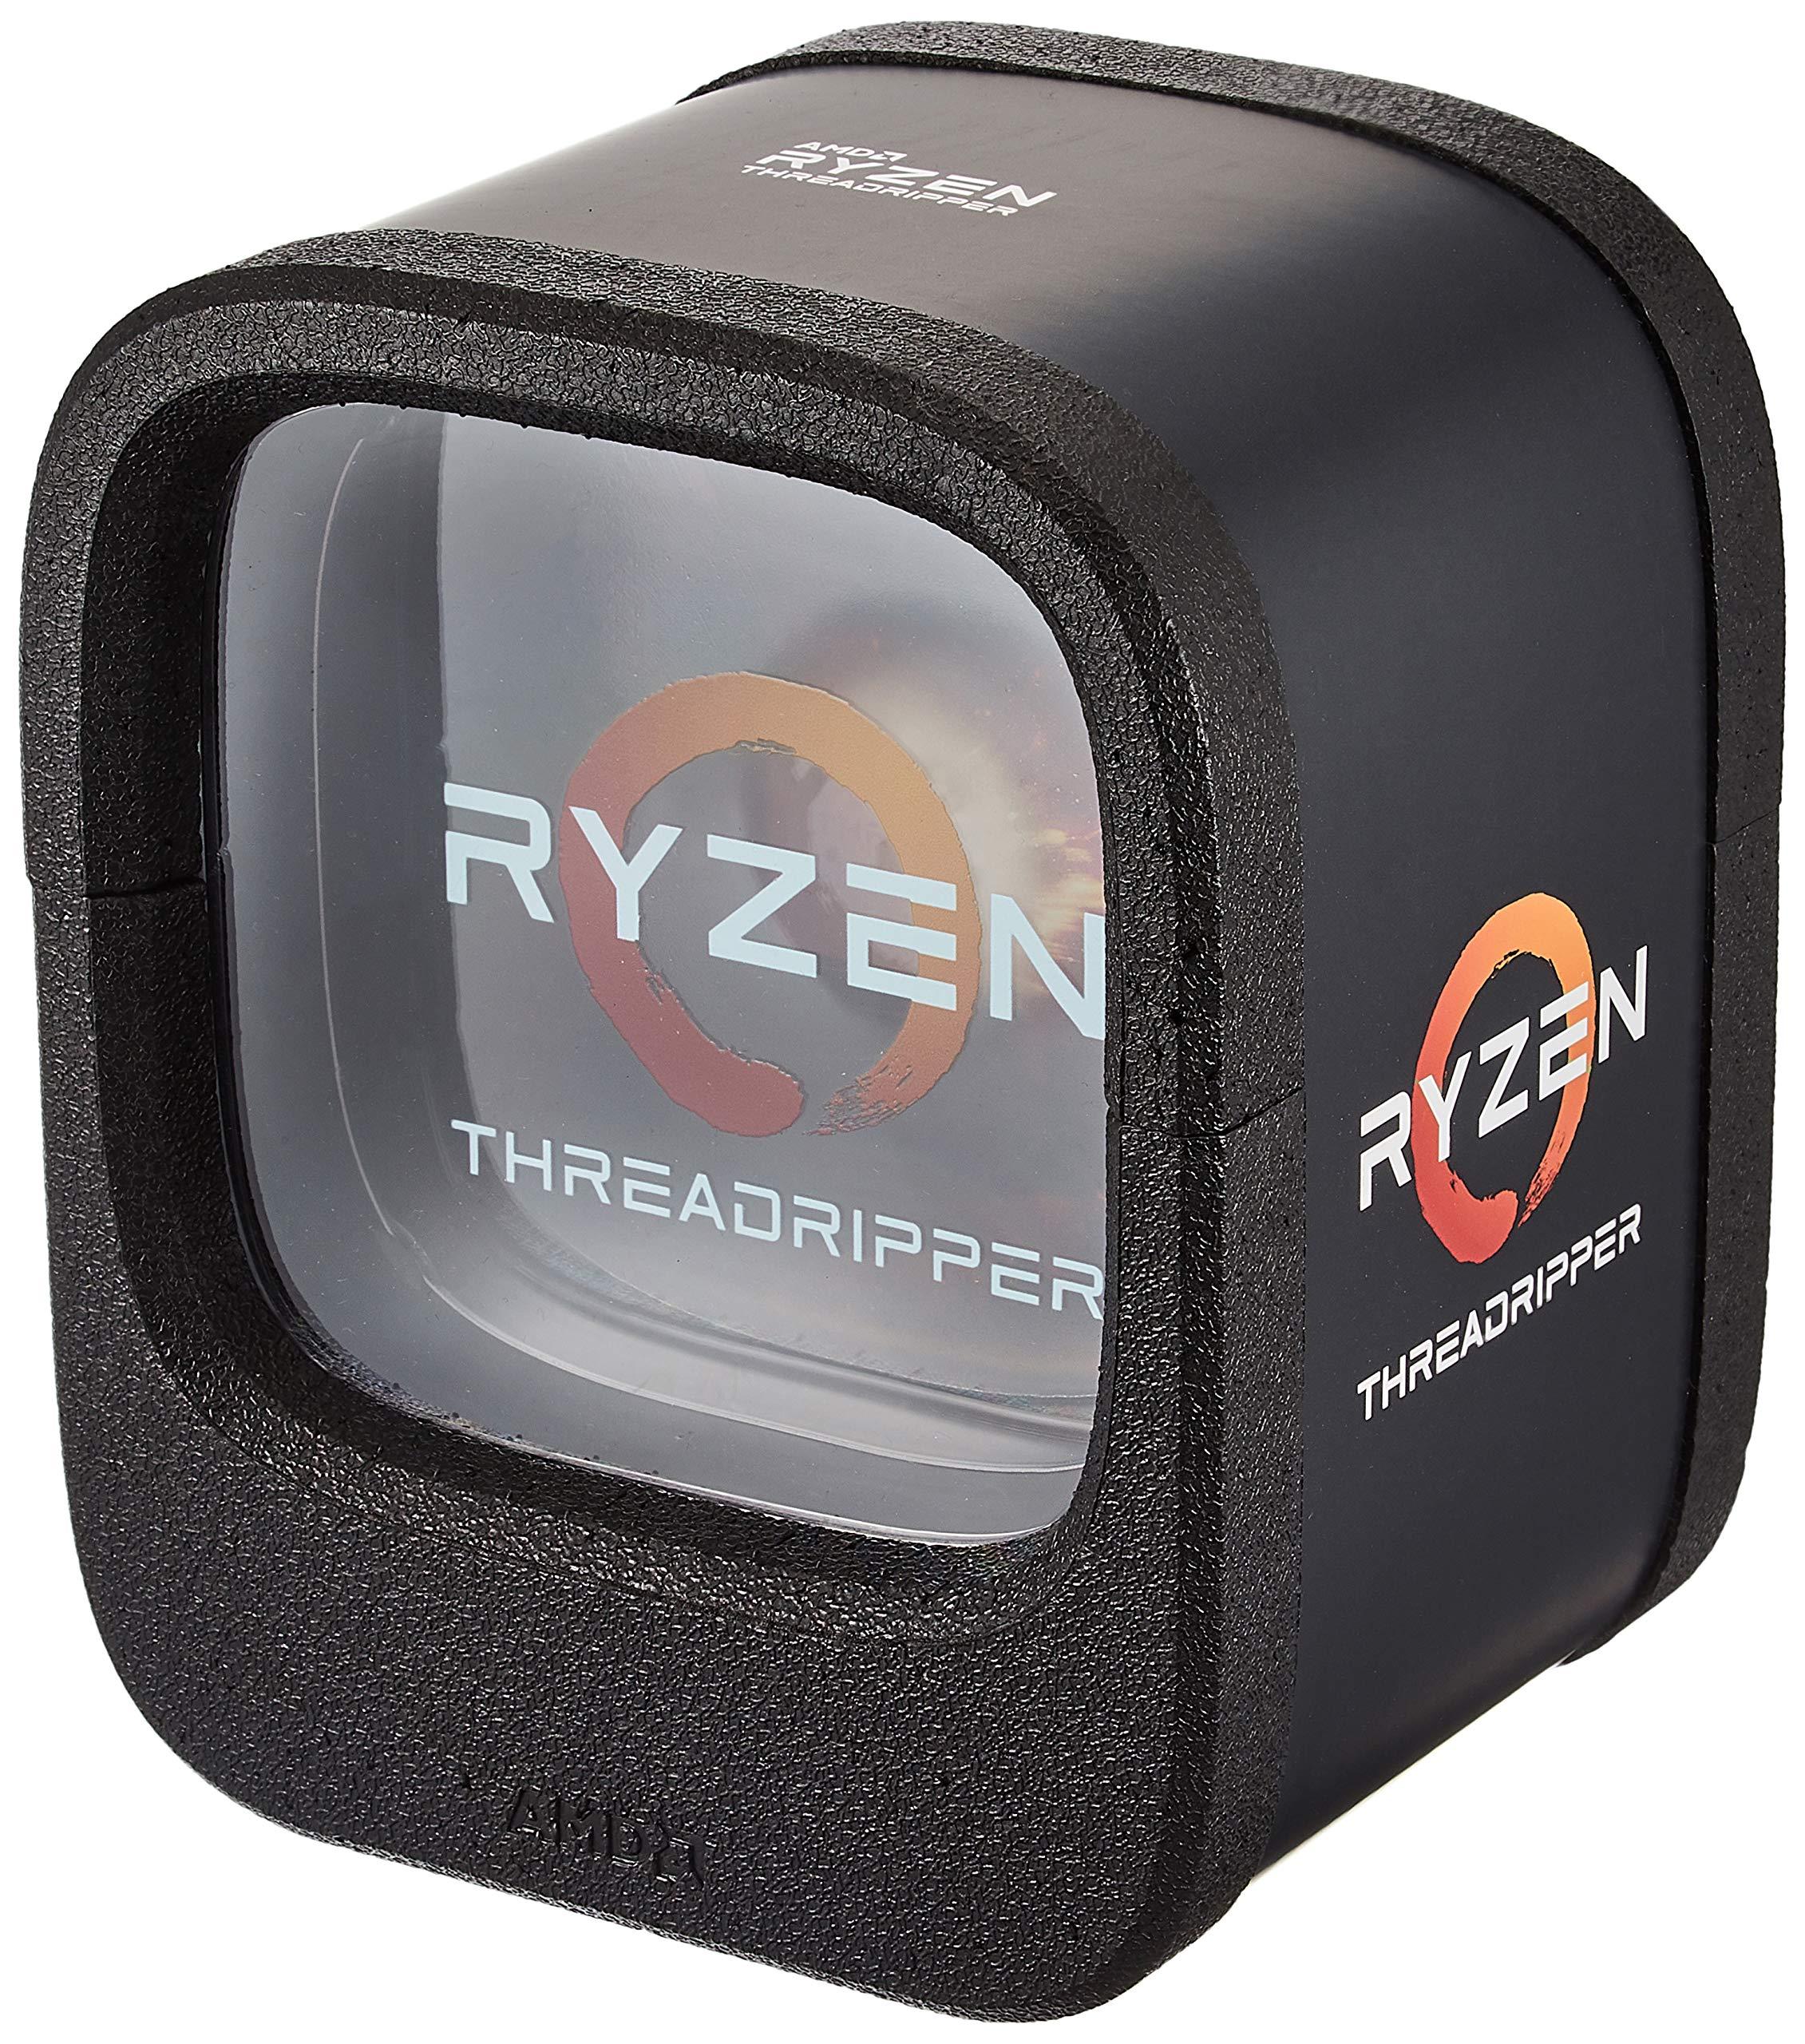 AMD-Ryzen-Threadripper-Processor